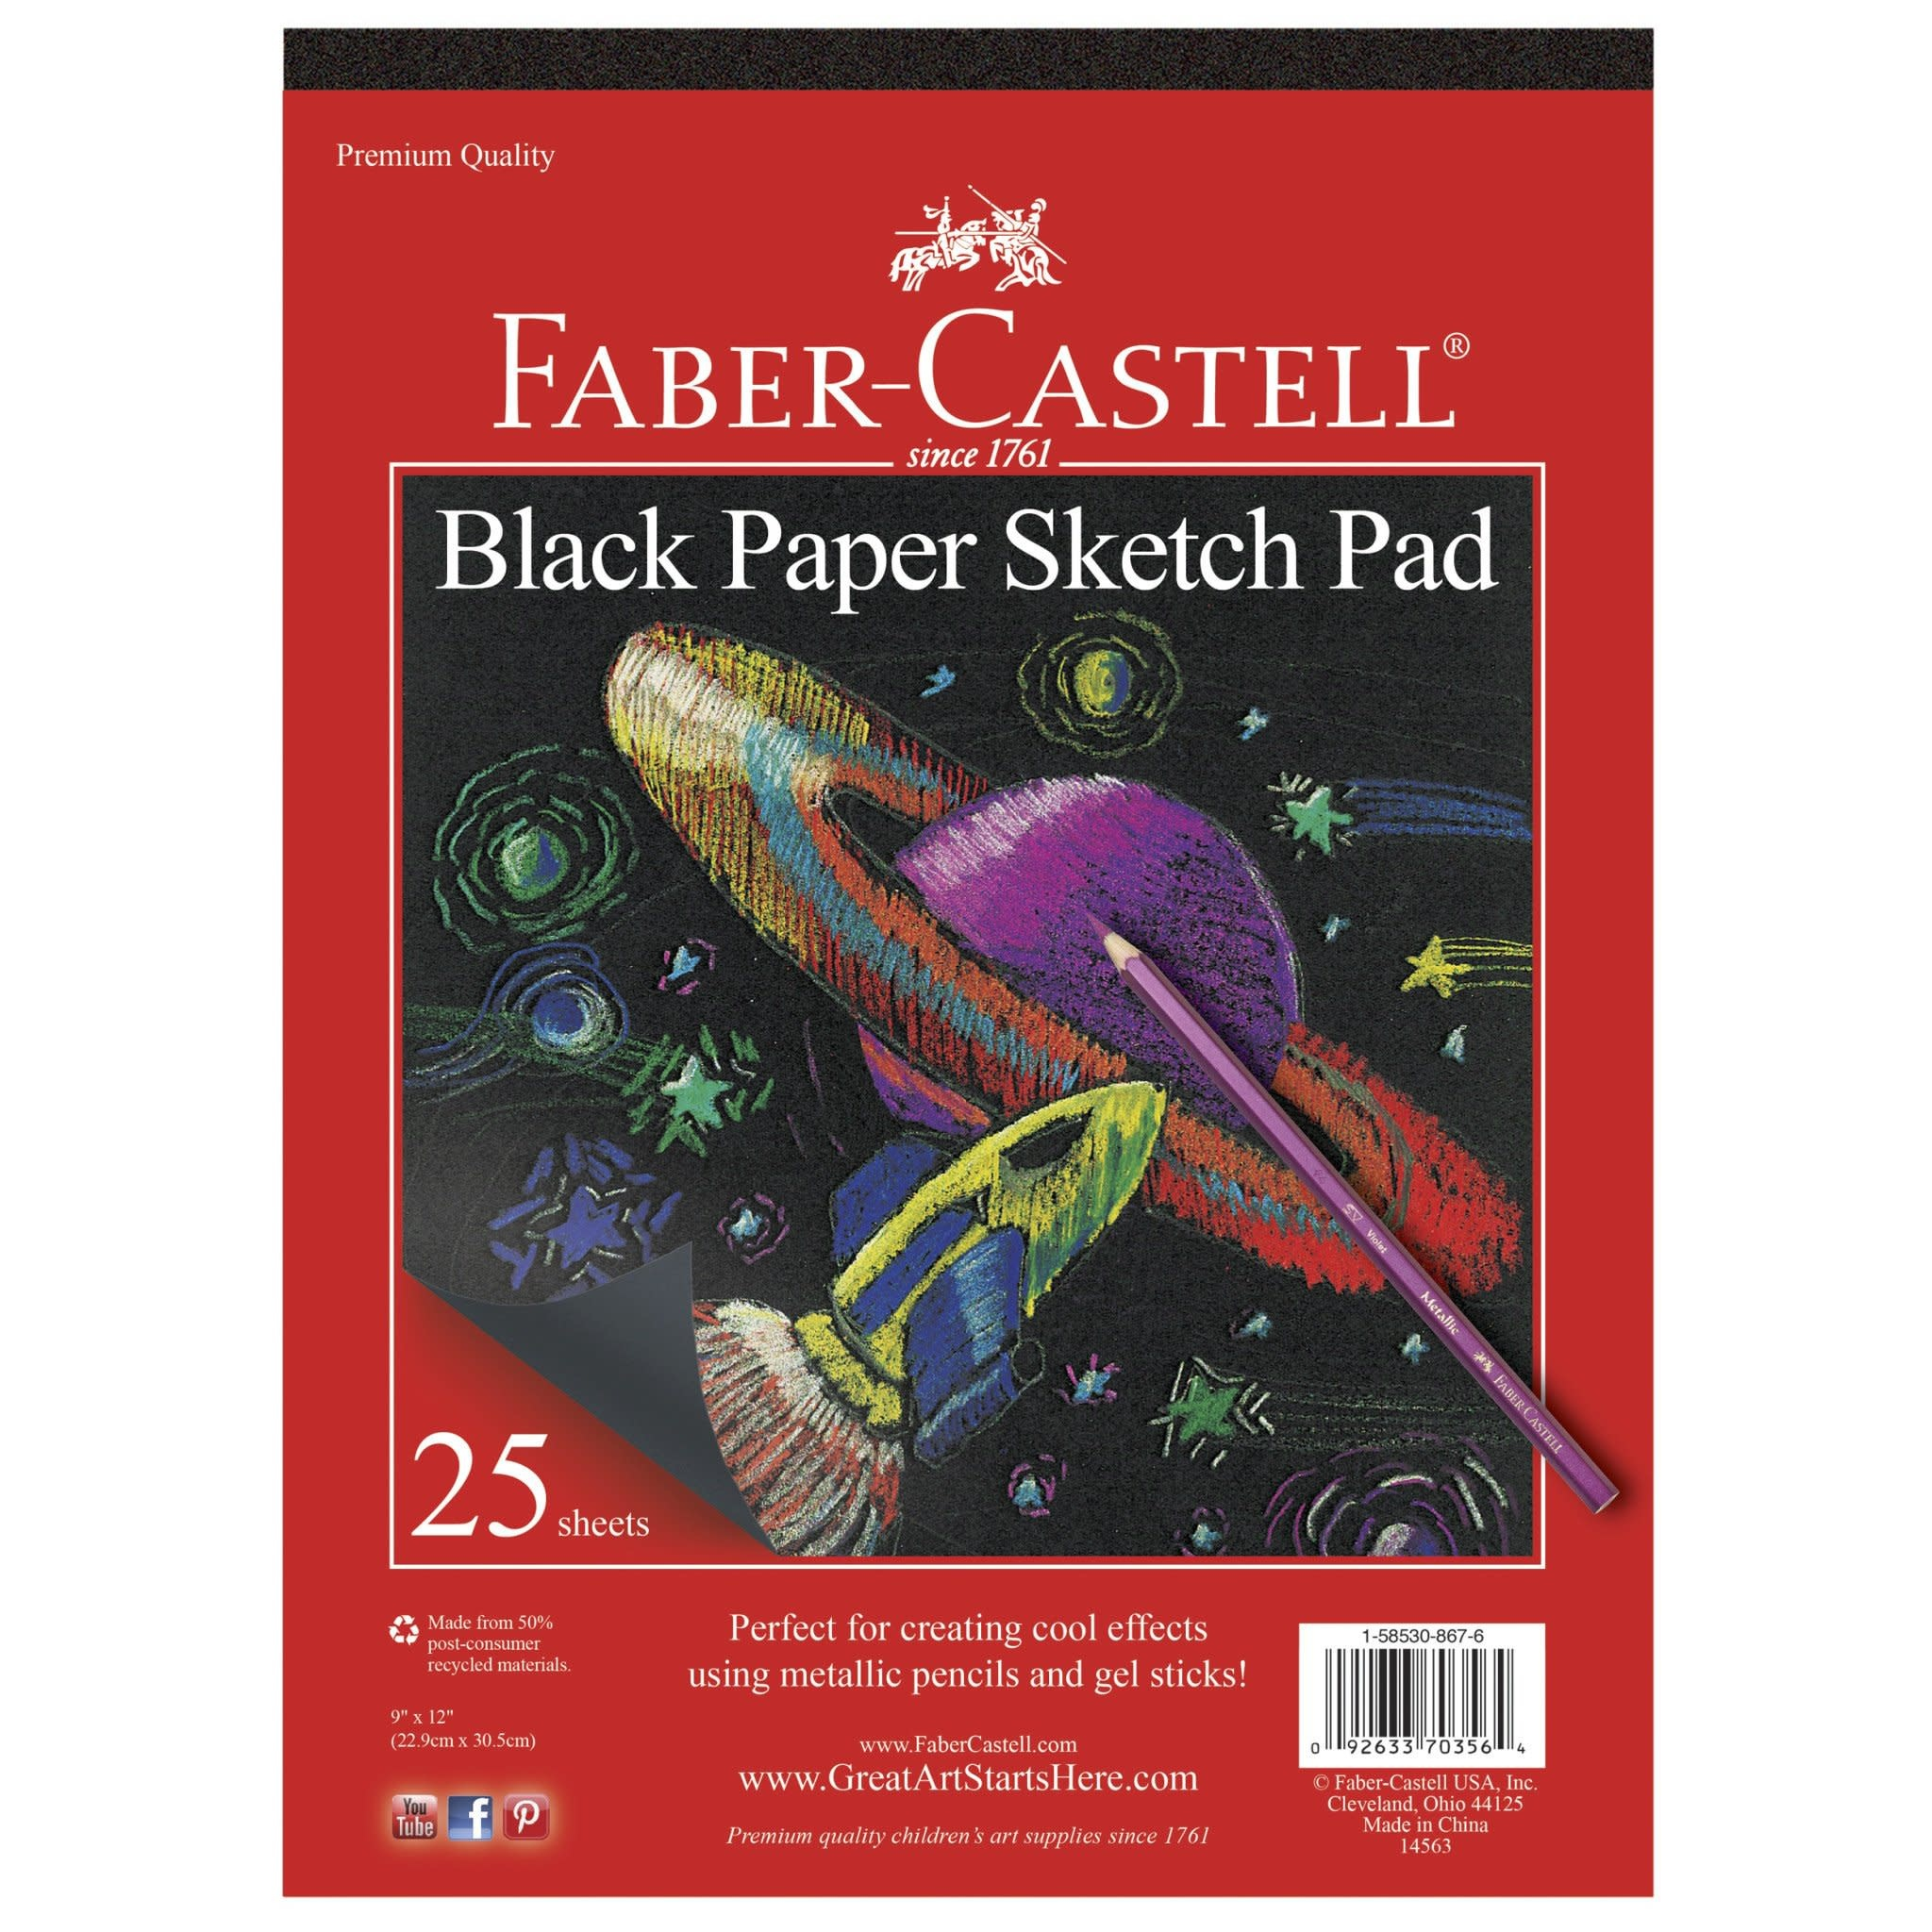 Black Paper Sketch Pad Faber-1